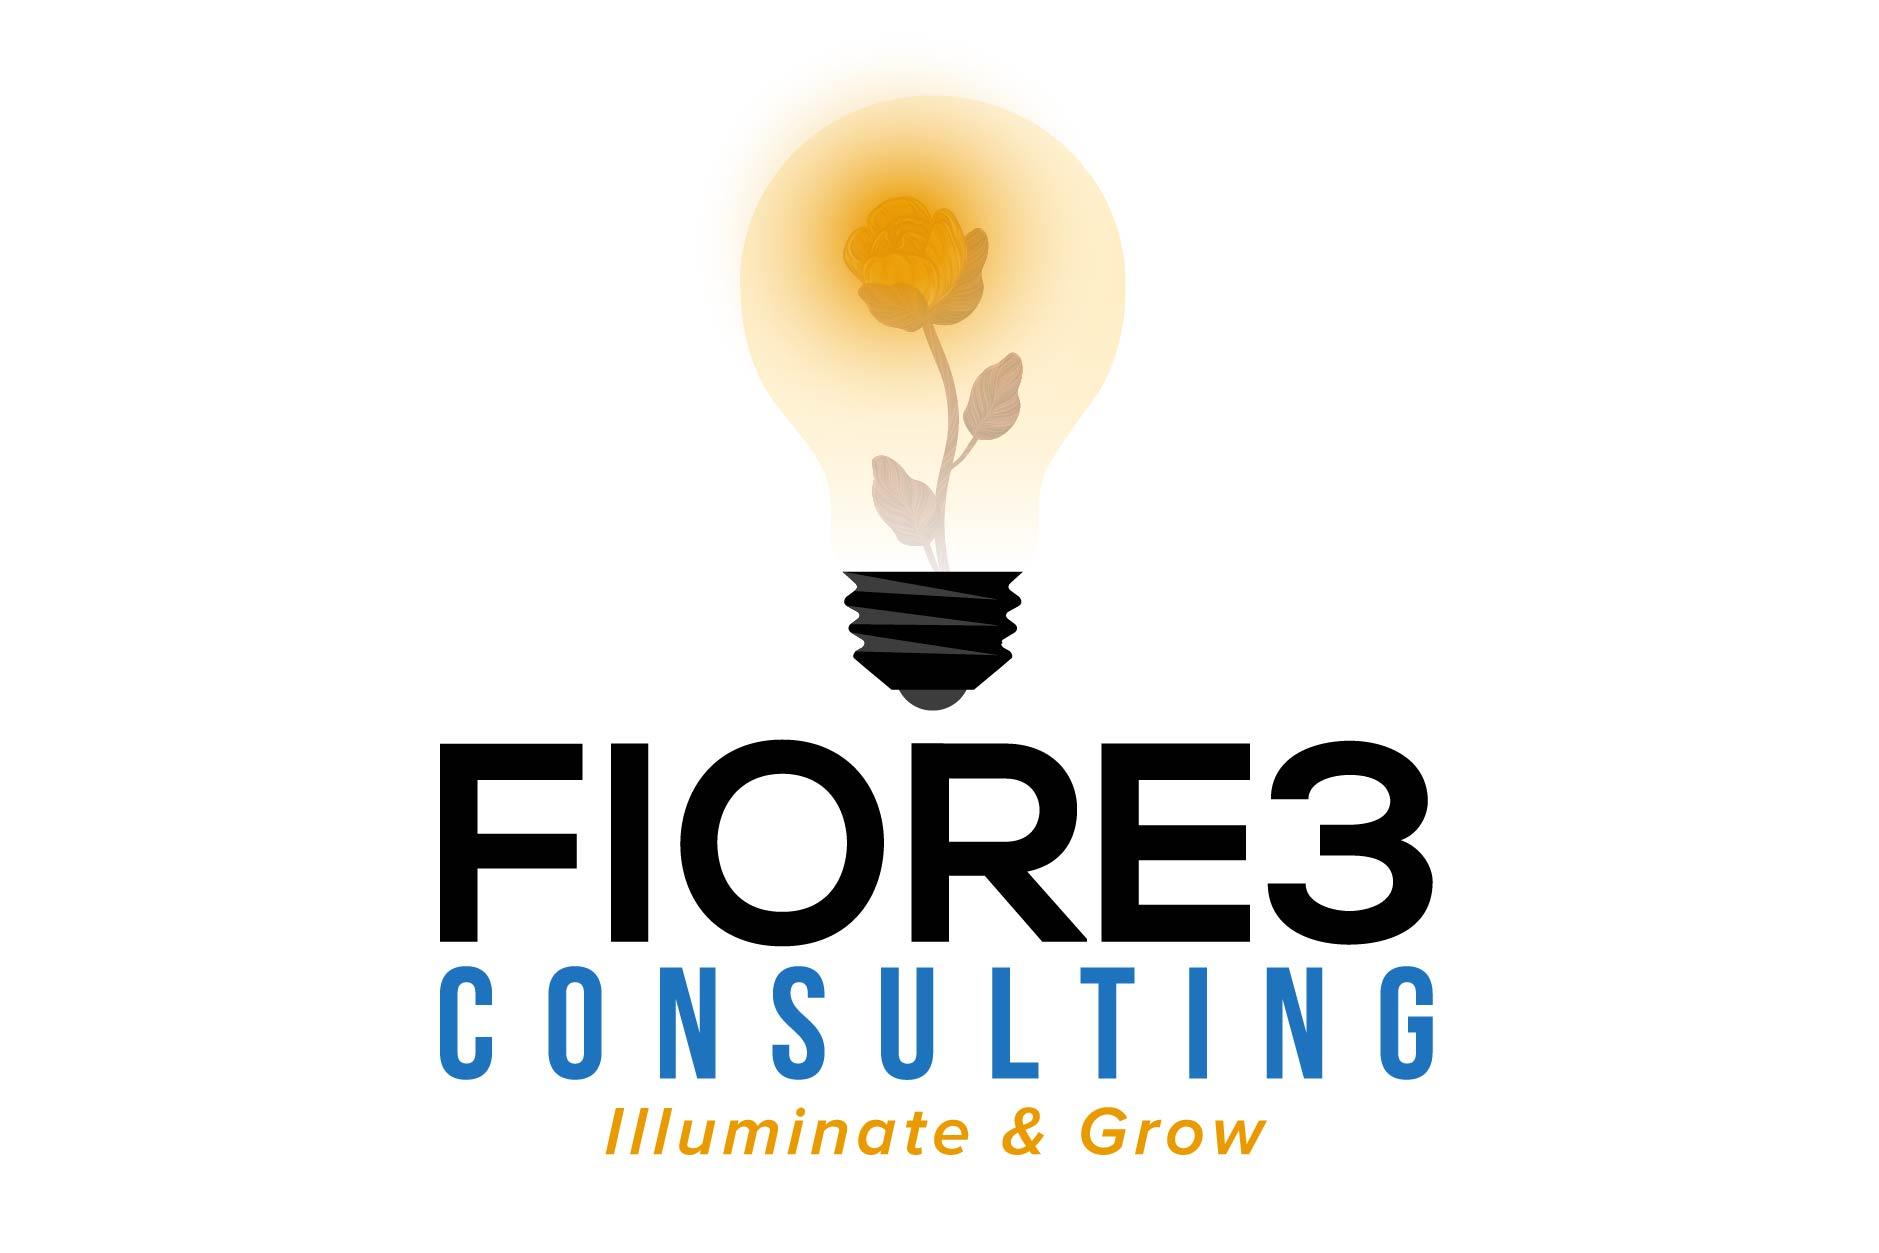 New Logo Fiore3 Consulting